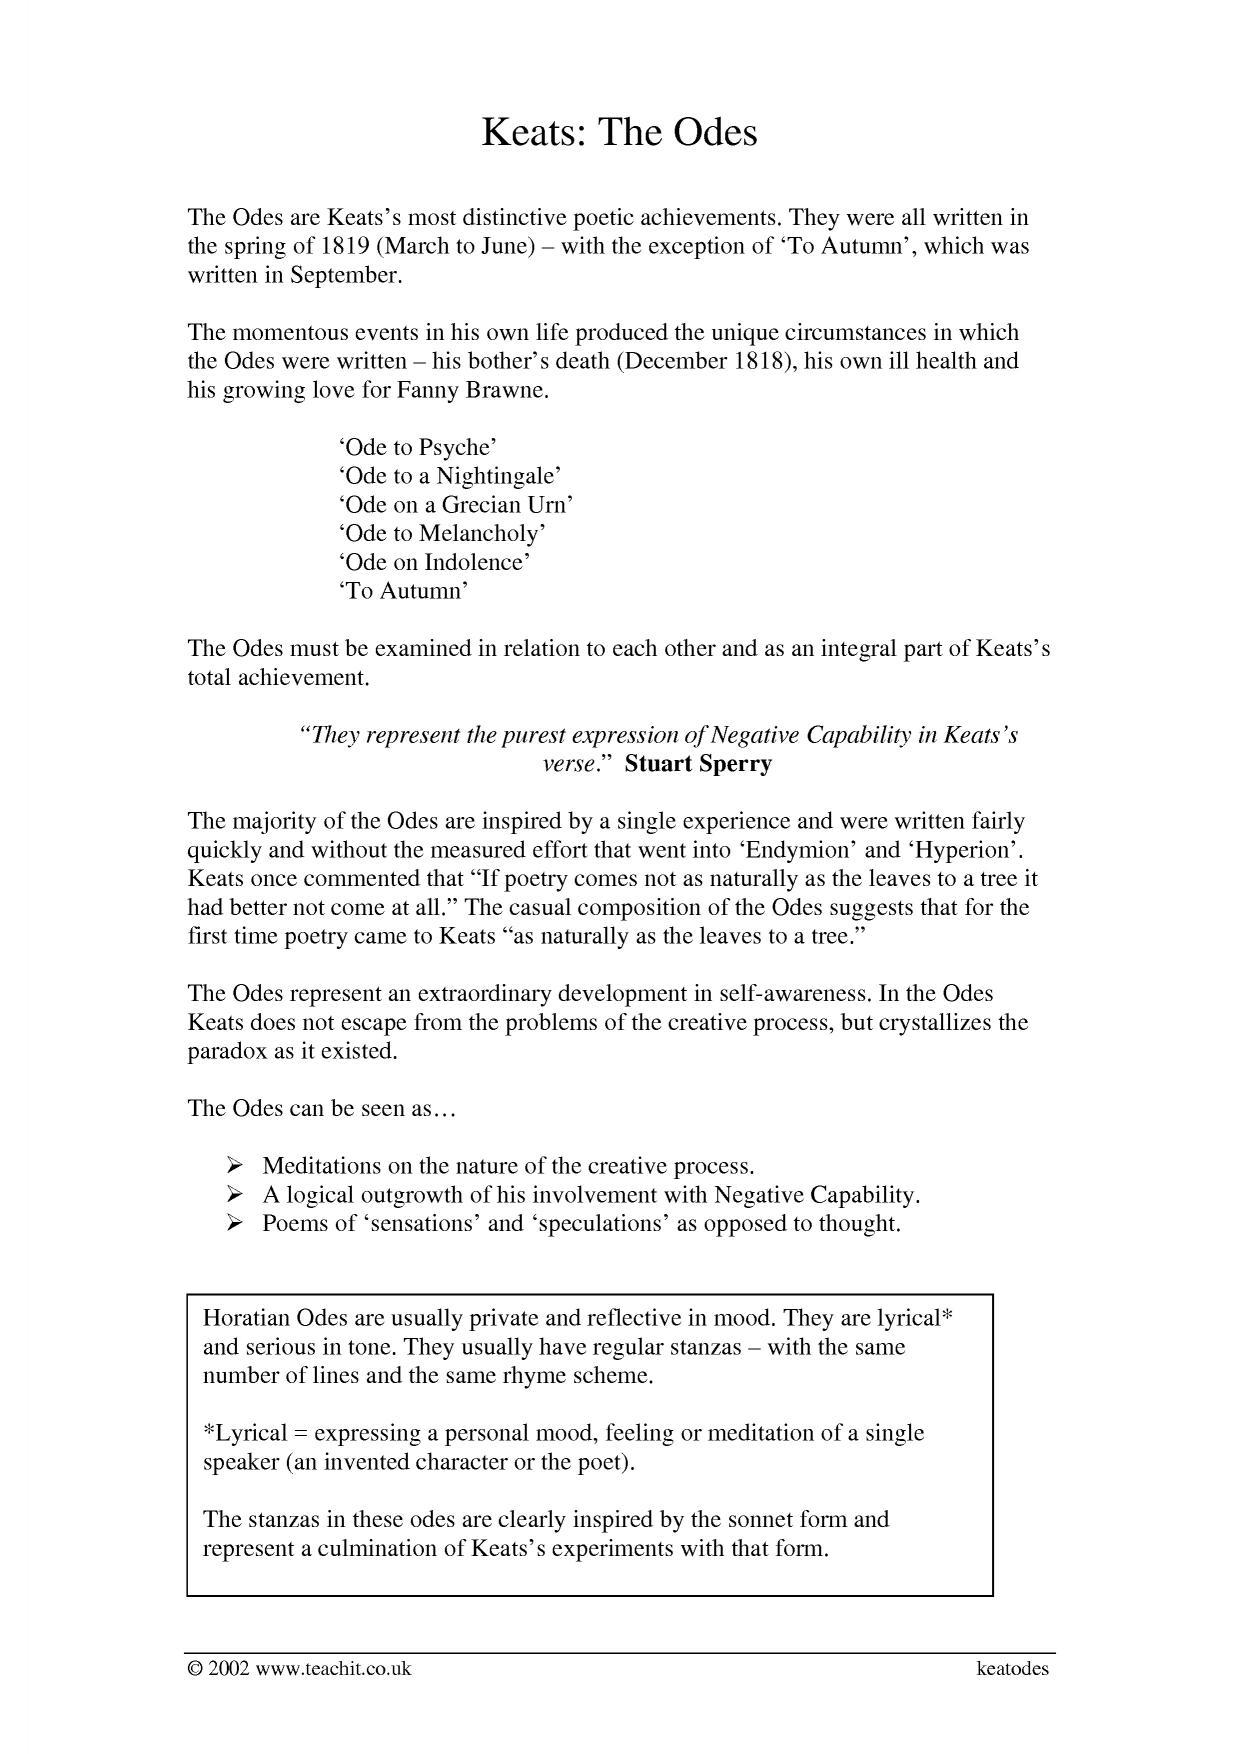 historical context of macbeth essay question